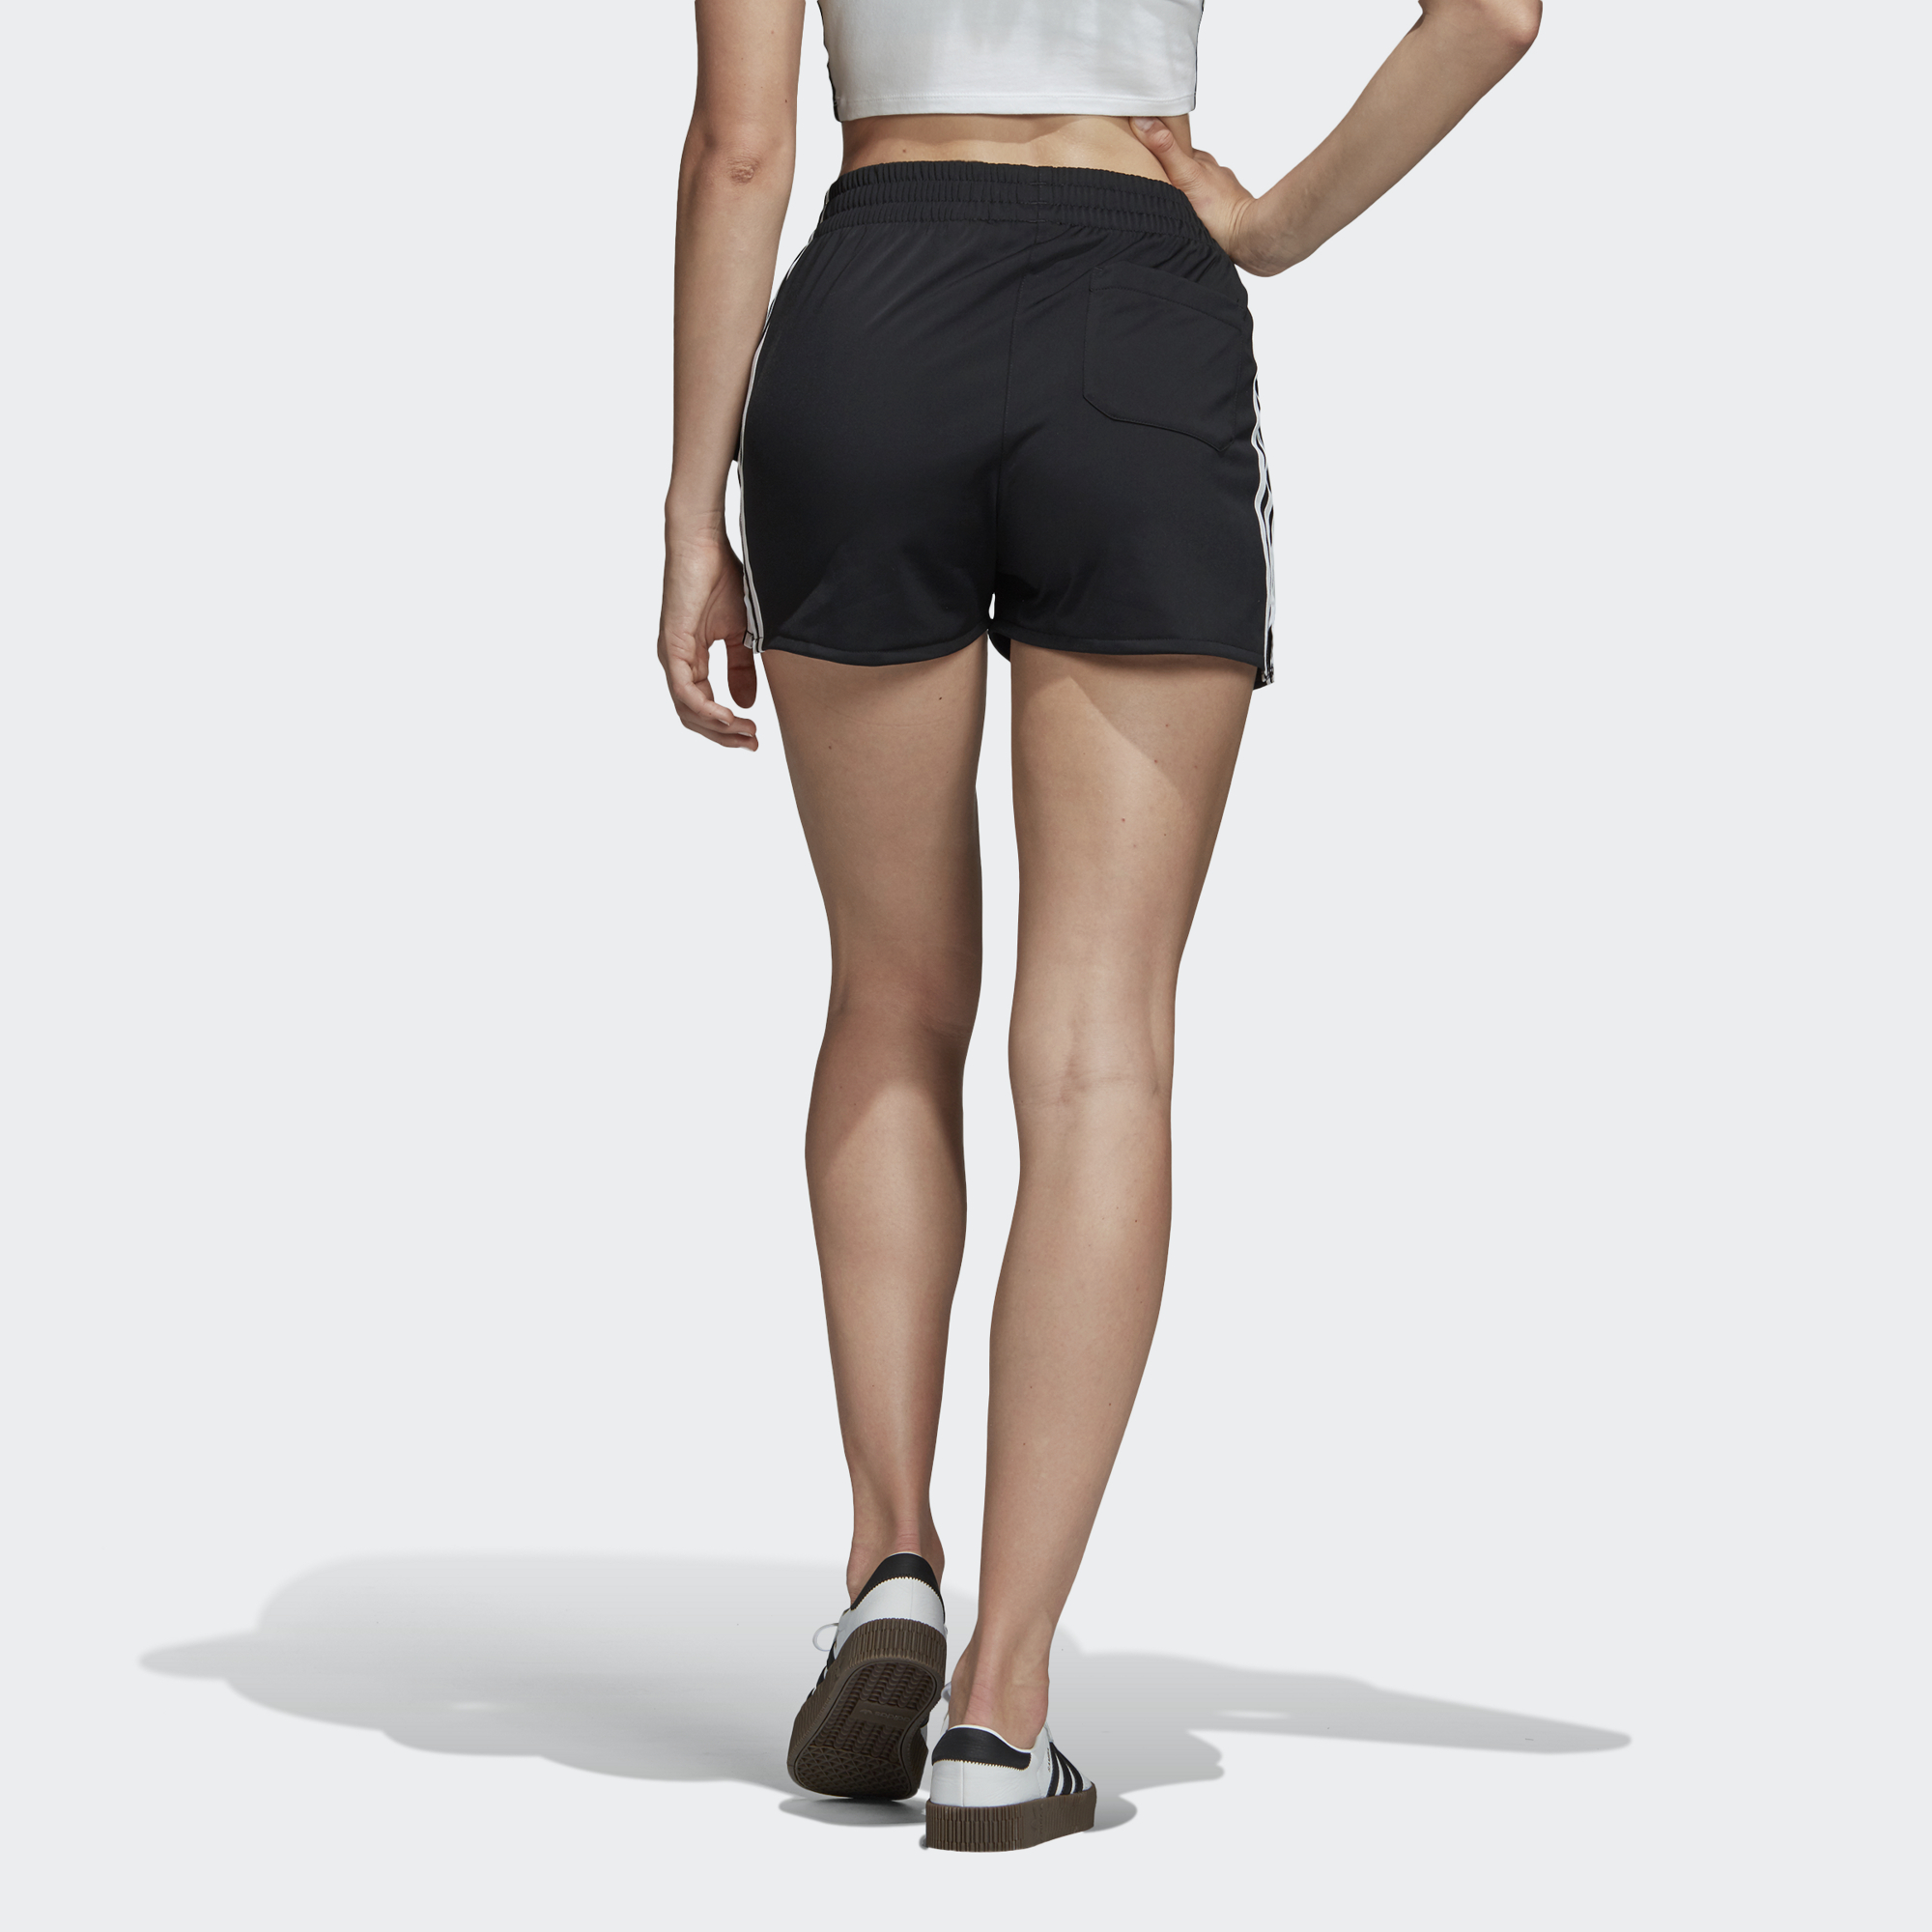 Szorty Adidas Originlas WMNS 3 Stripes Short black